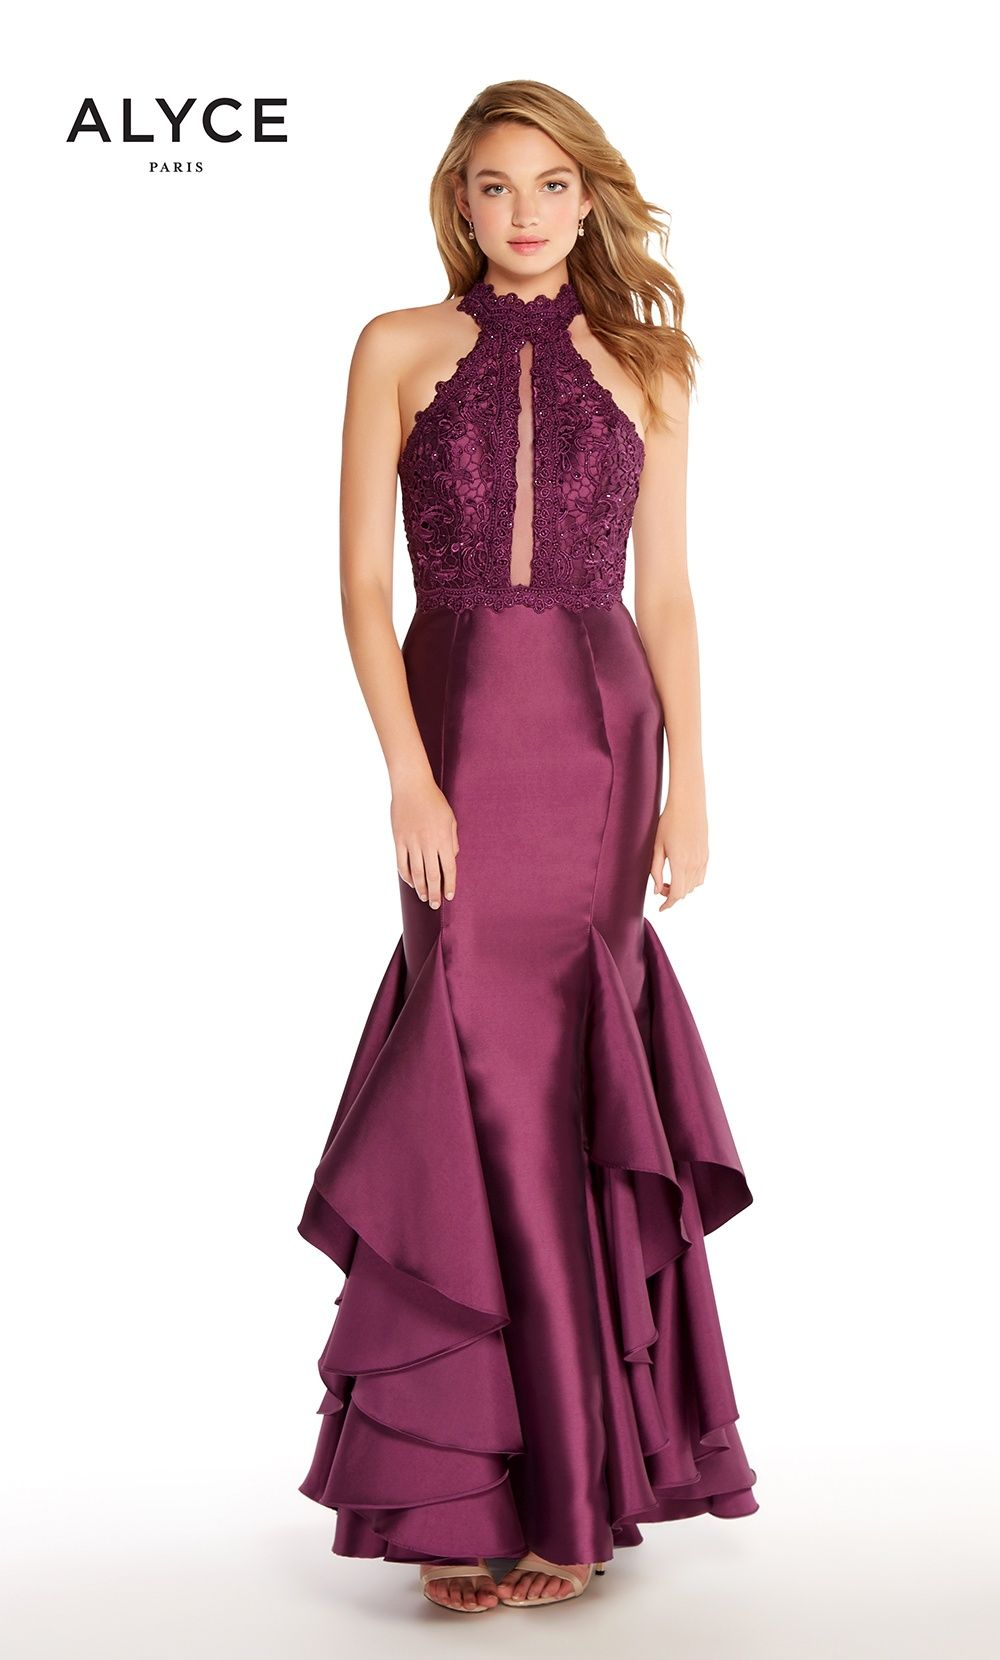 Prom dresses evening dresses by alyce parisucbrueaayucbruelong